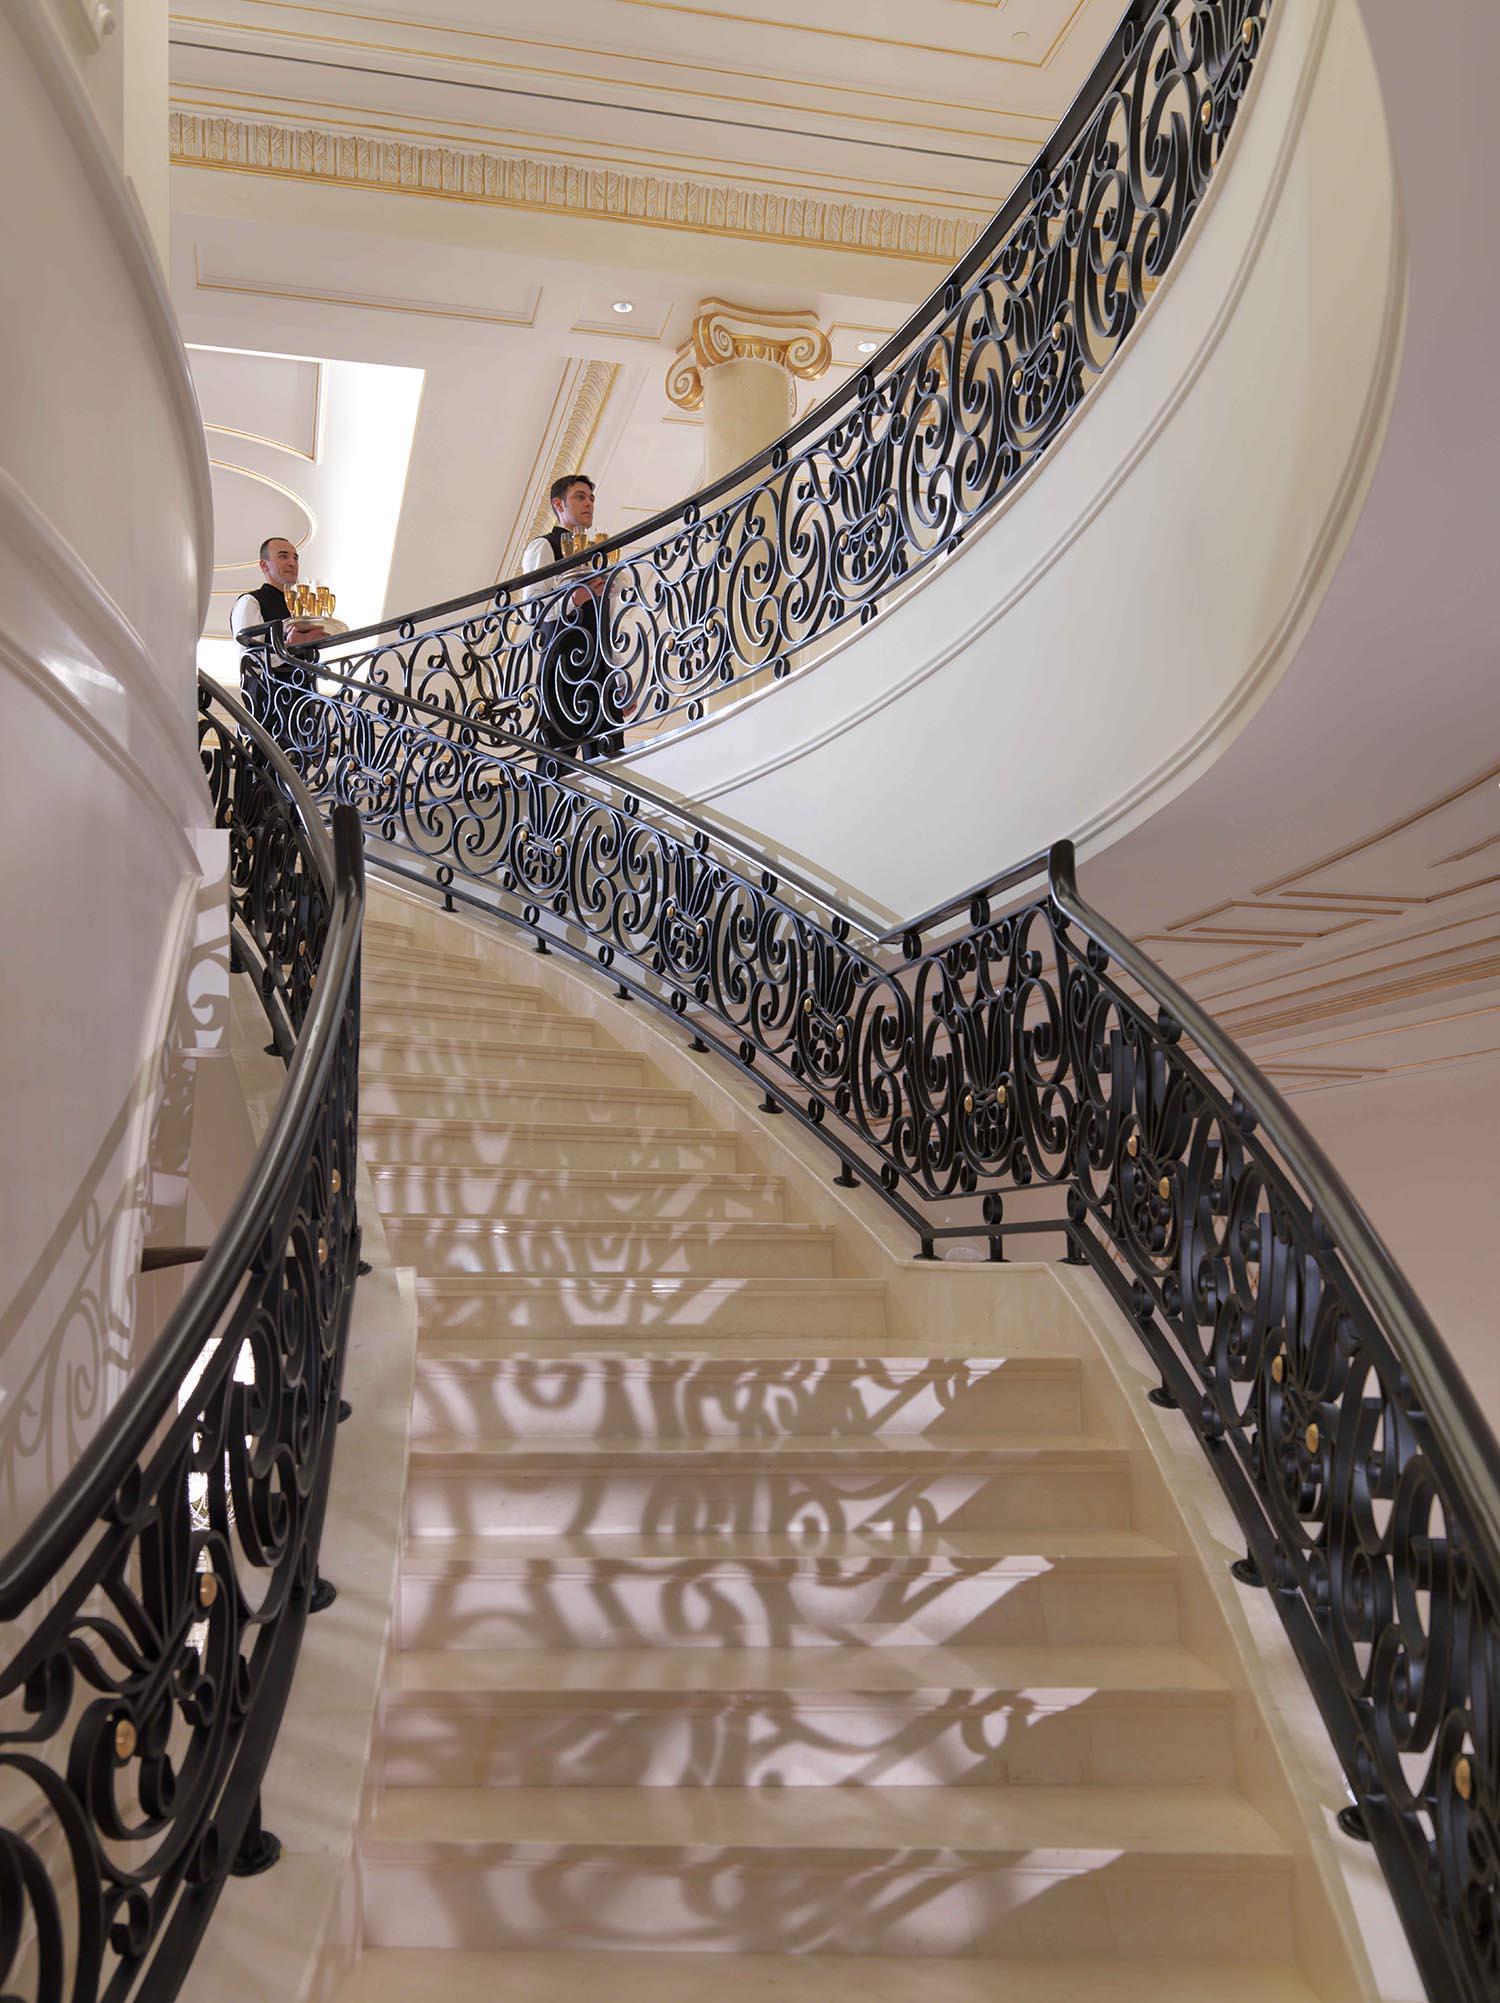 FSBK Staircase Service_0002.jpg